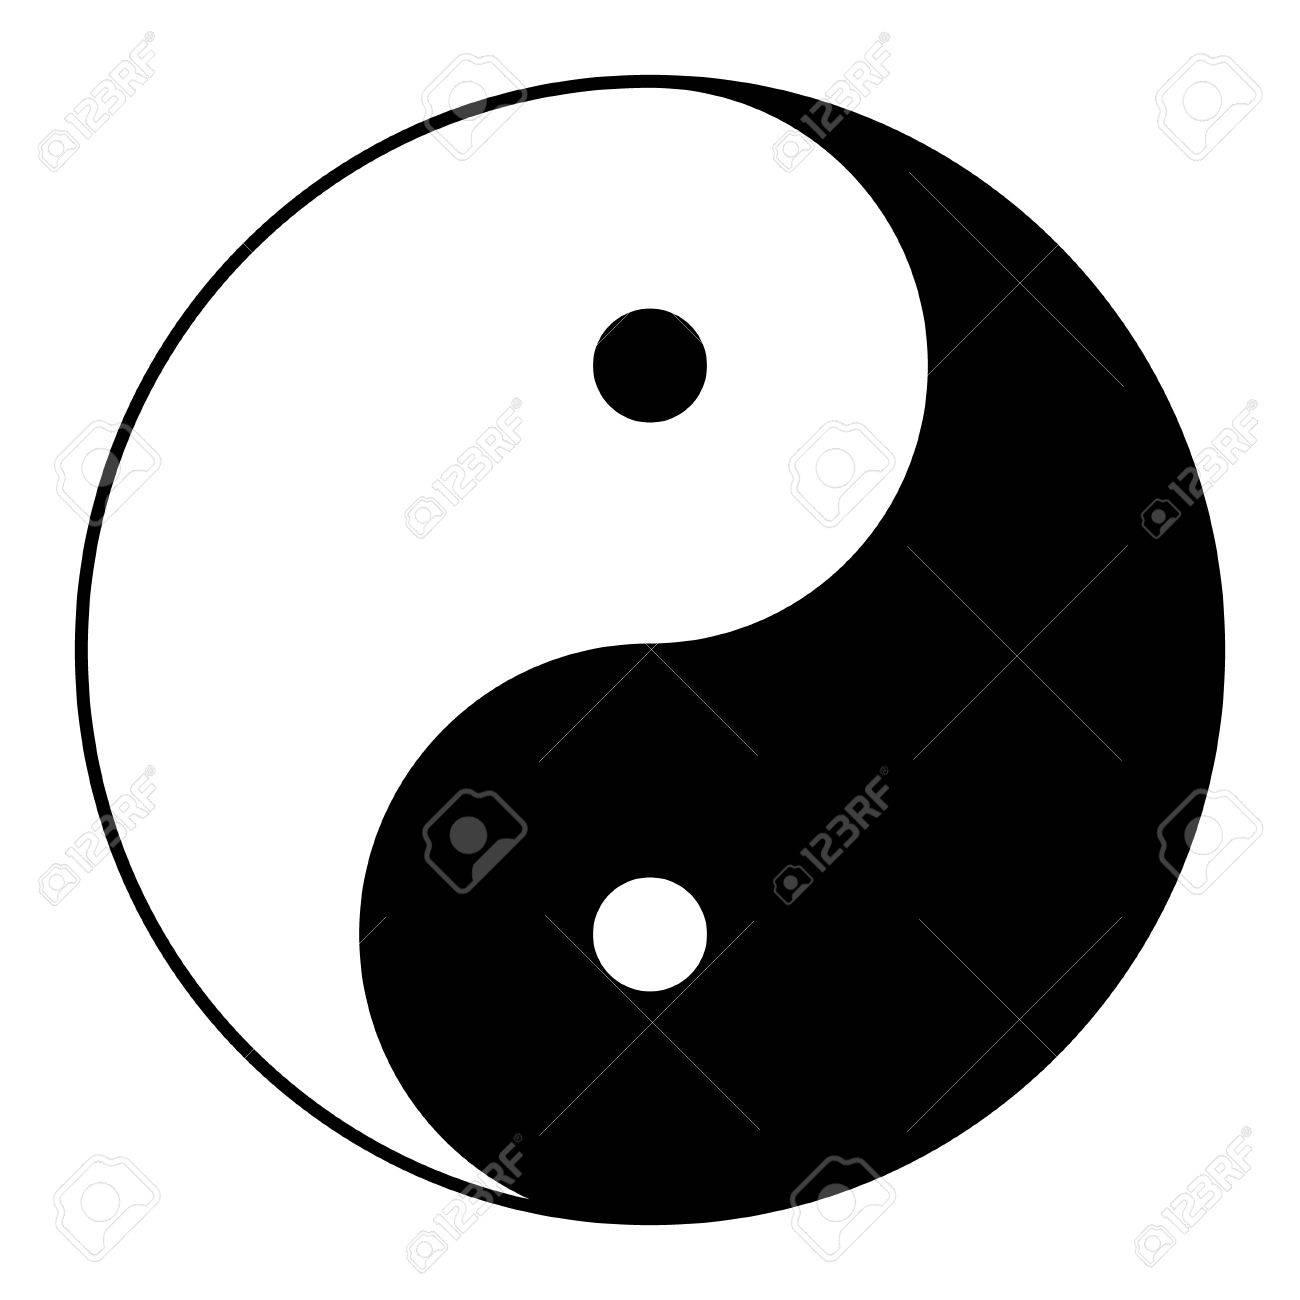 Ying yang symbol of harmony and balance - 73787096